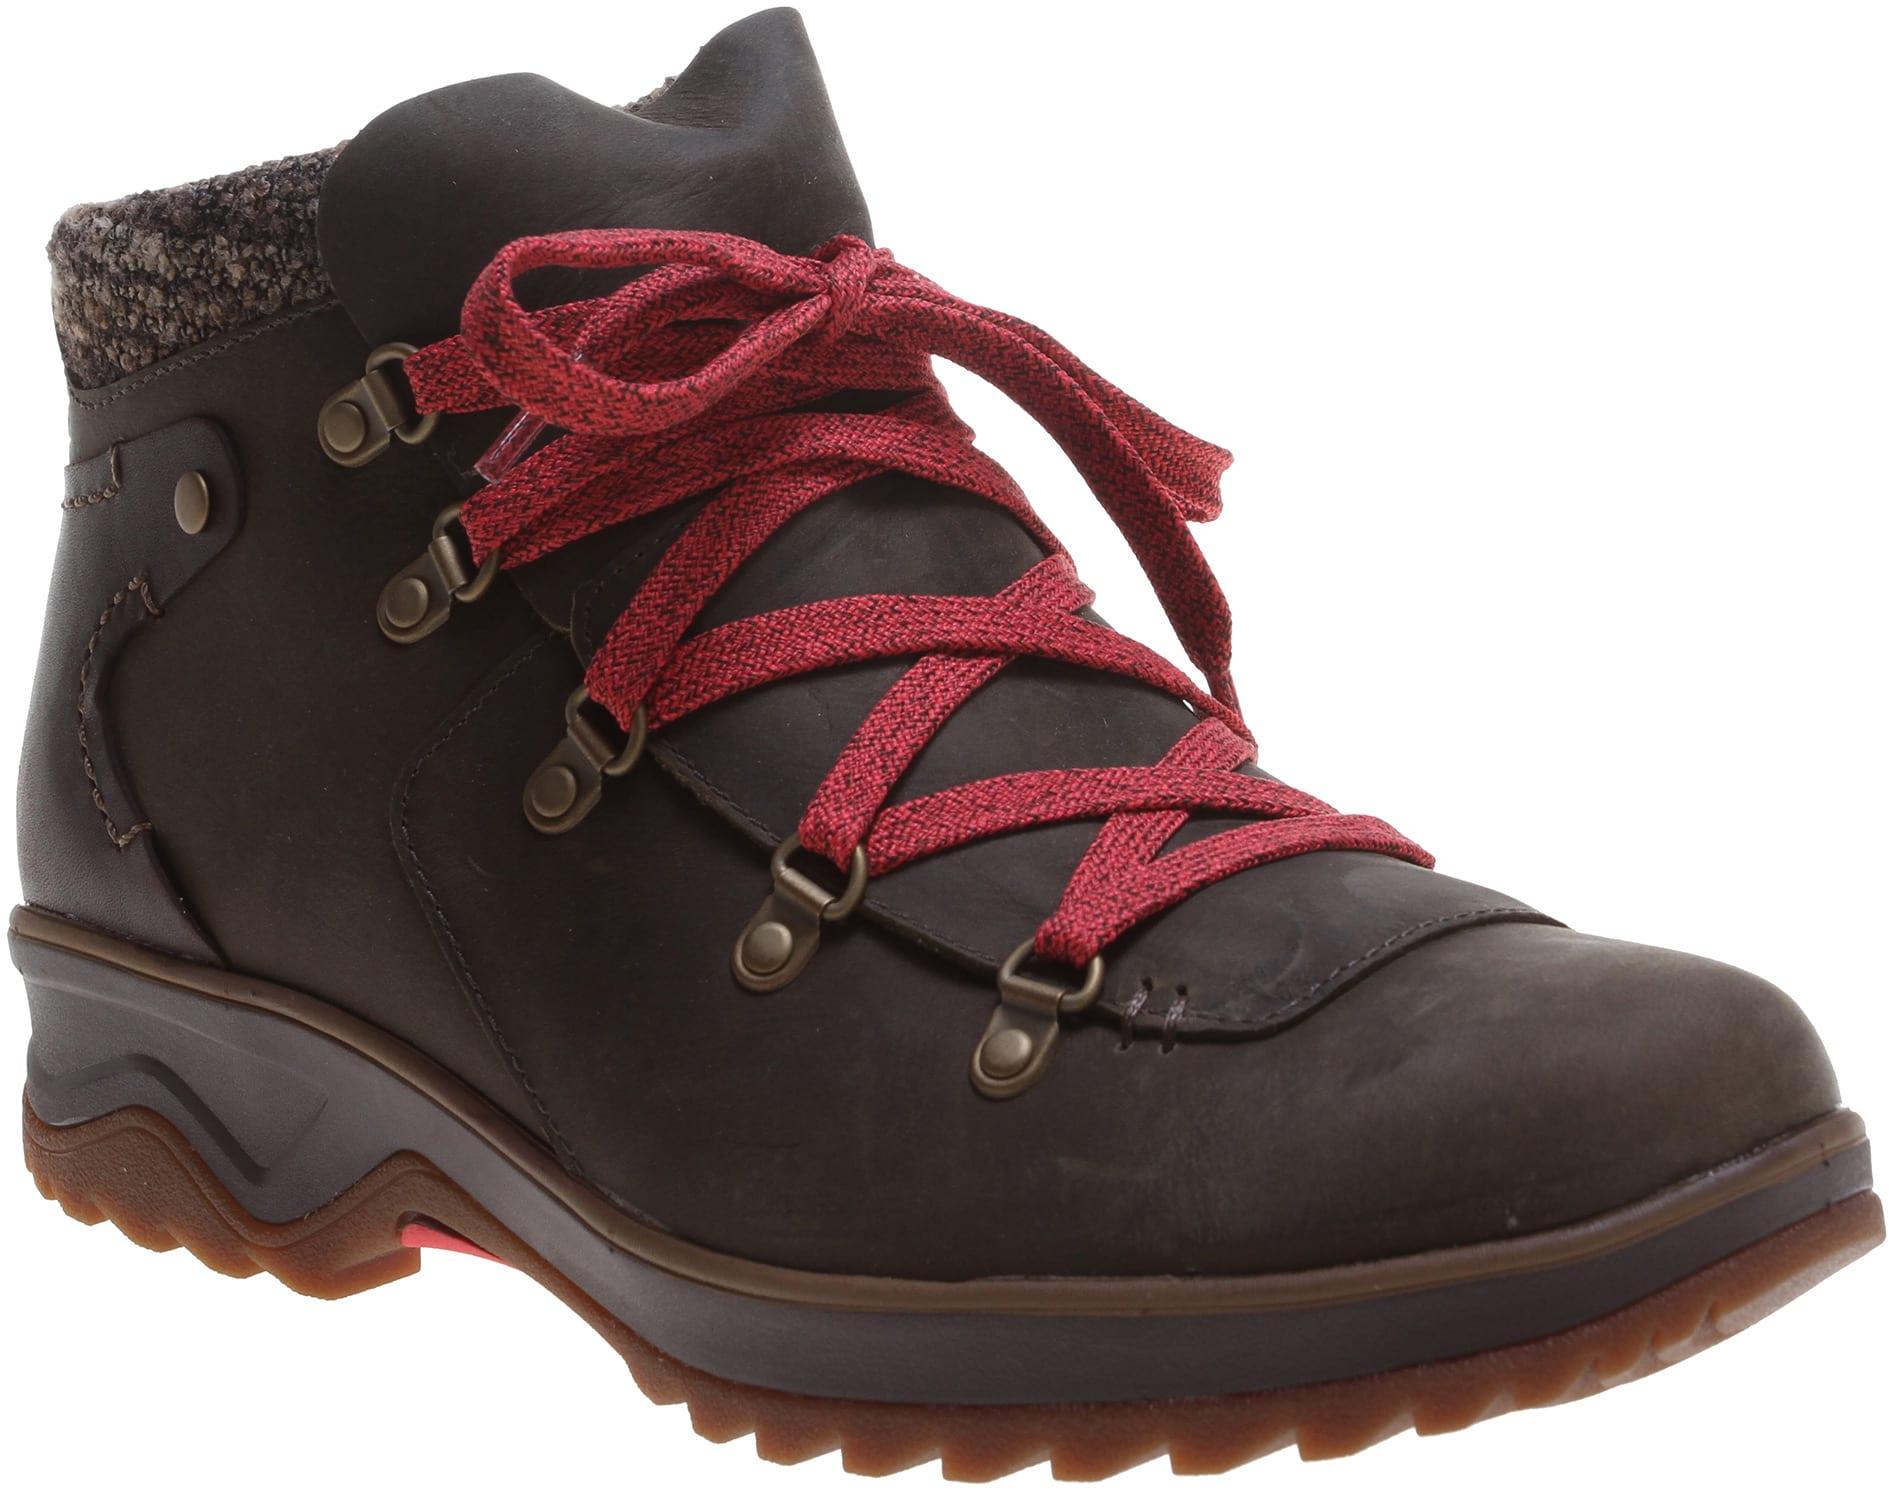 Cool Womenu0026#39;s Merrell Grassbow Air Hiking Shoes - 654155 Hiking ...